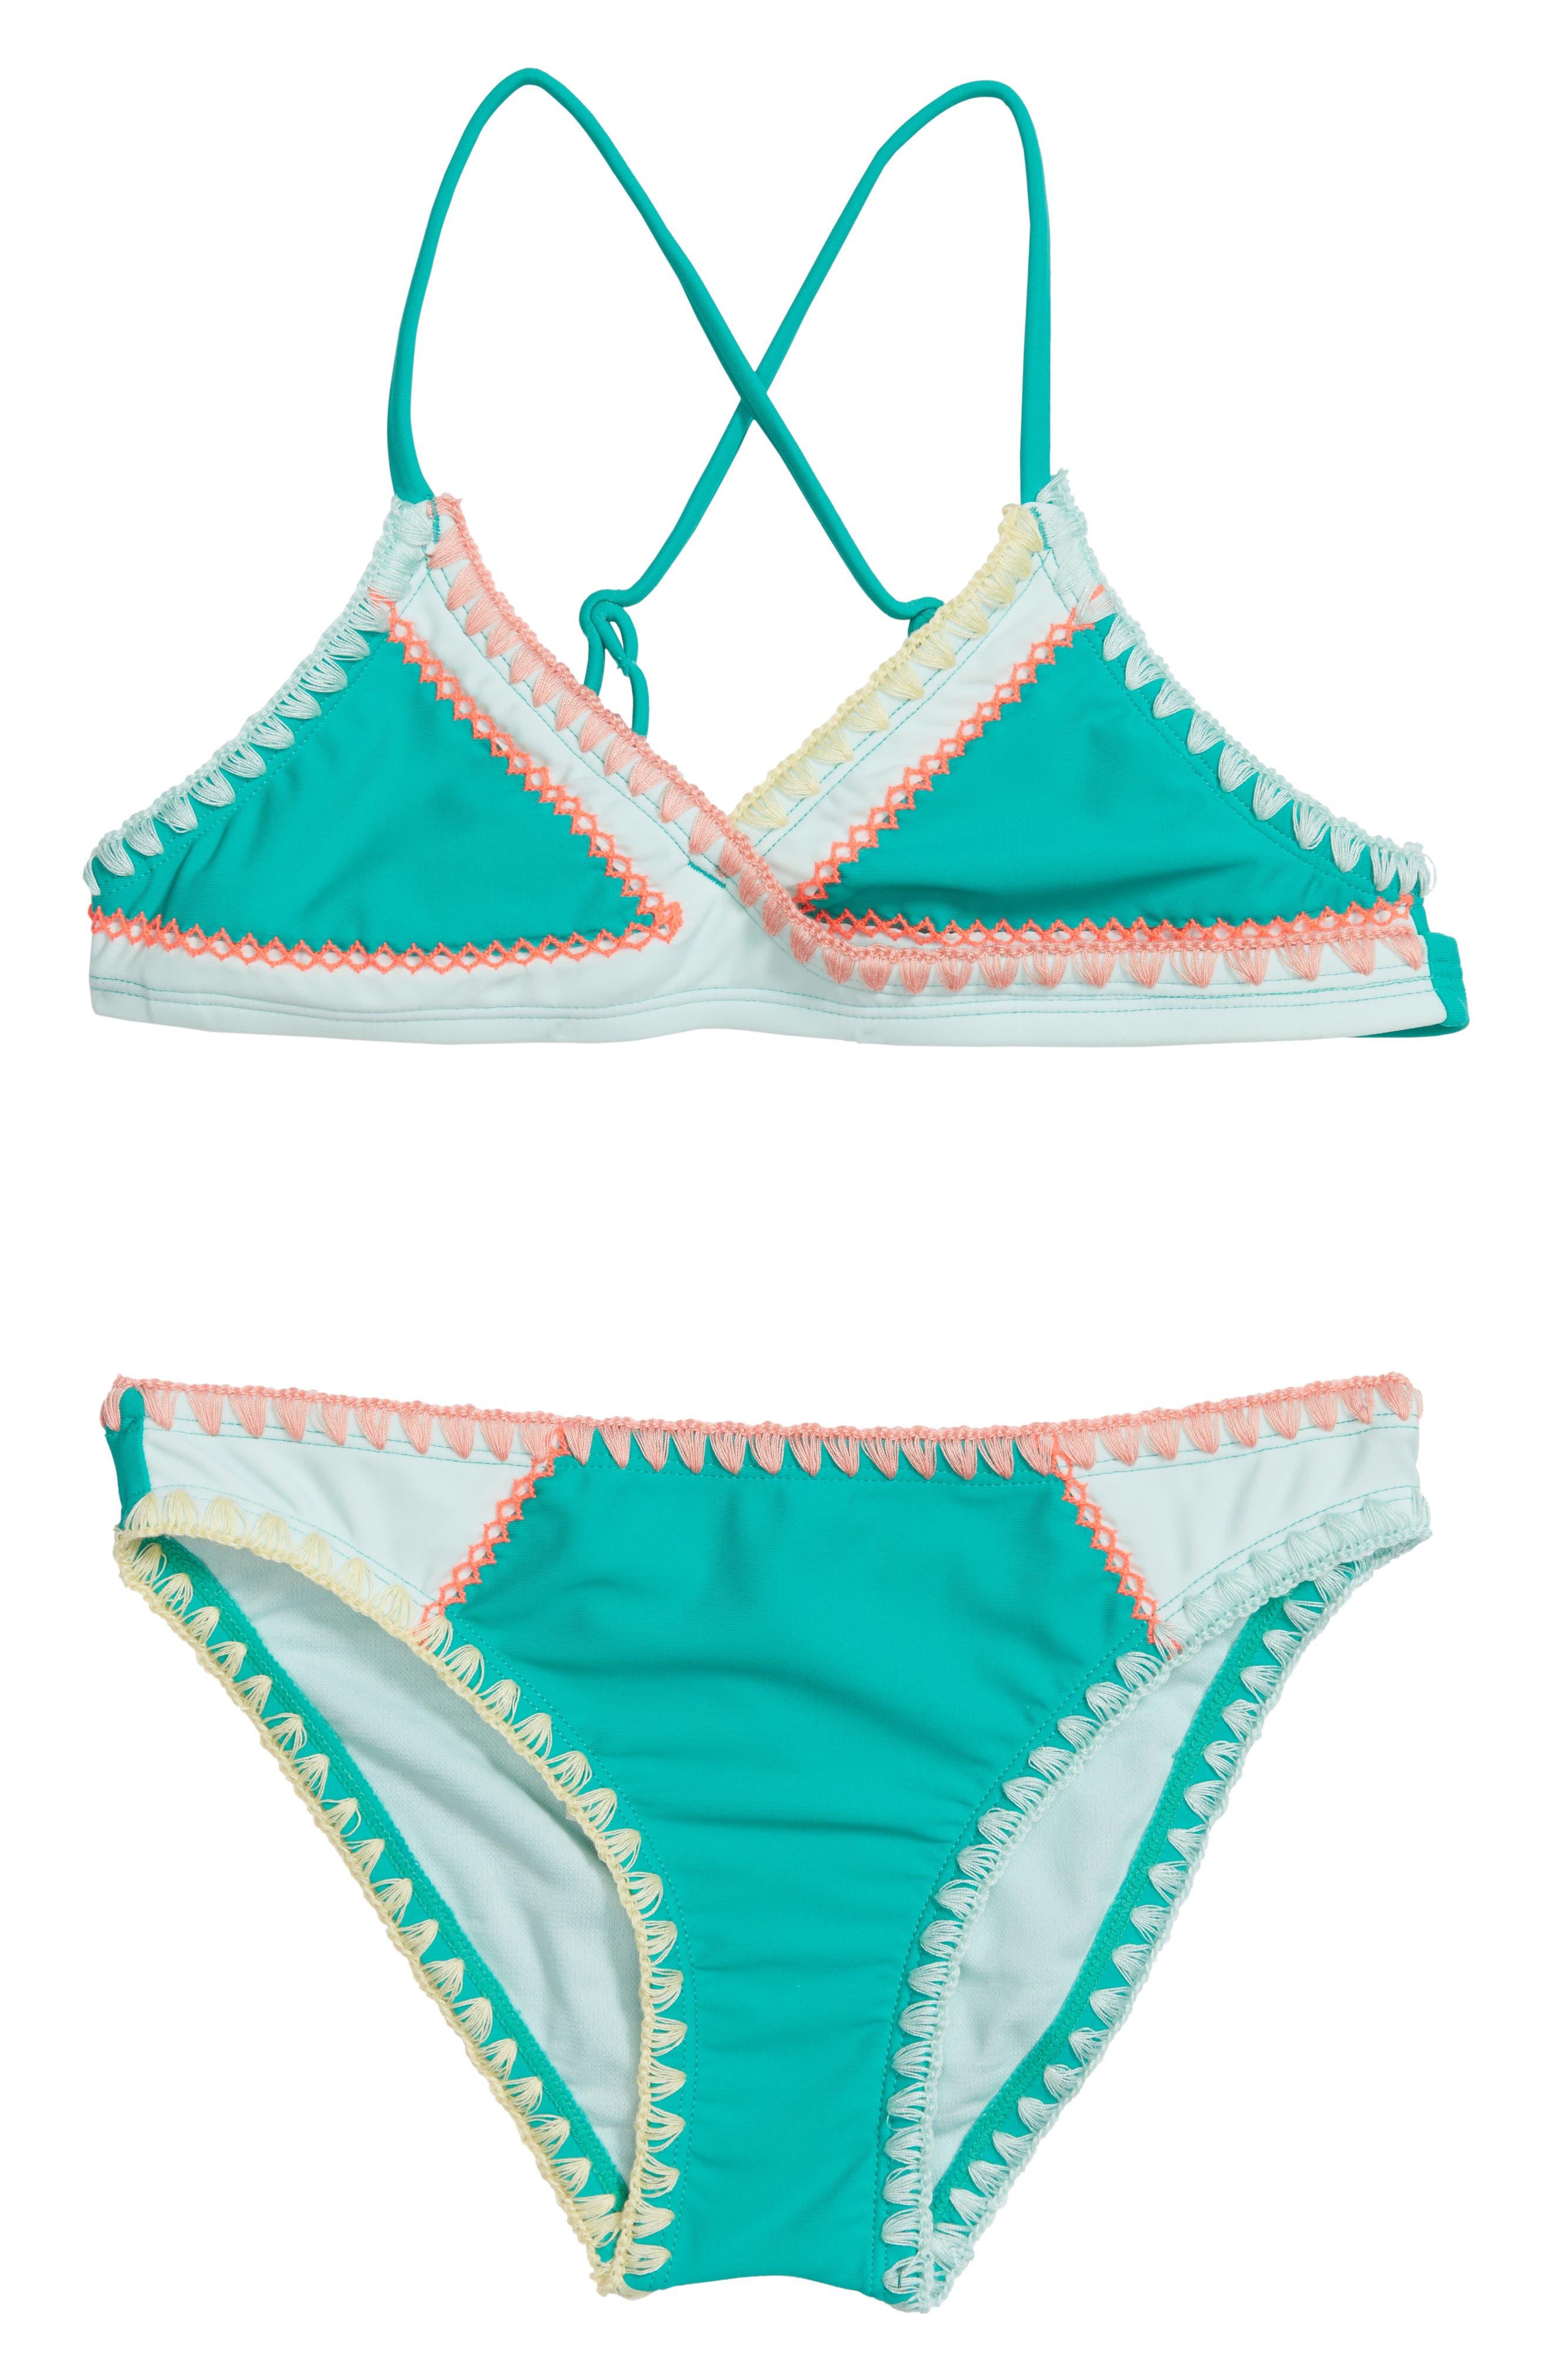 Main Image - Hobie Keep The Piece Two-Piece Swimsuit (Big Girls)